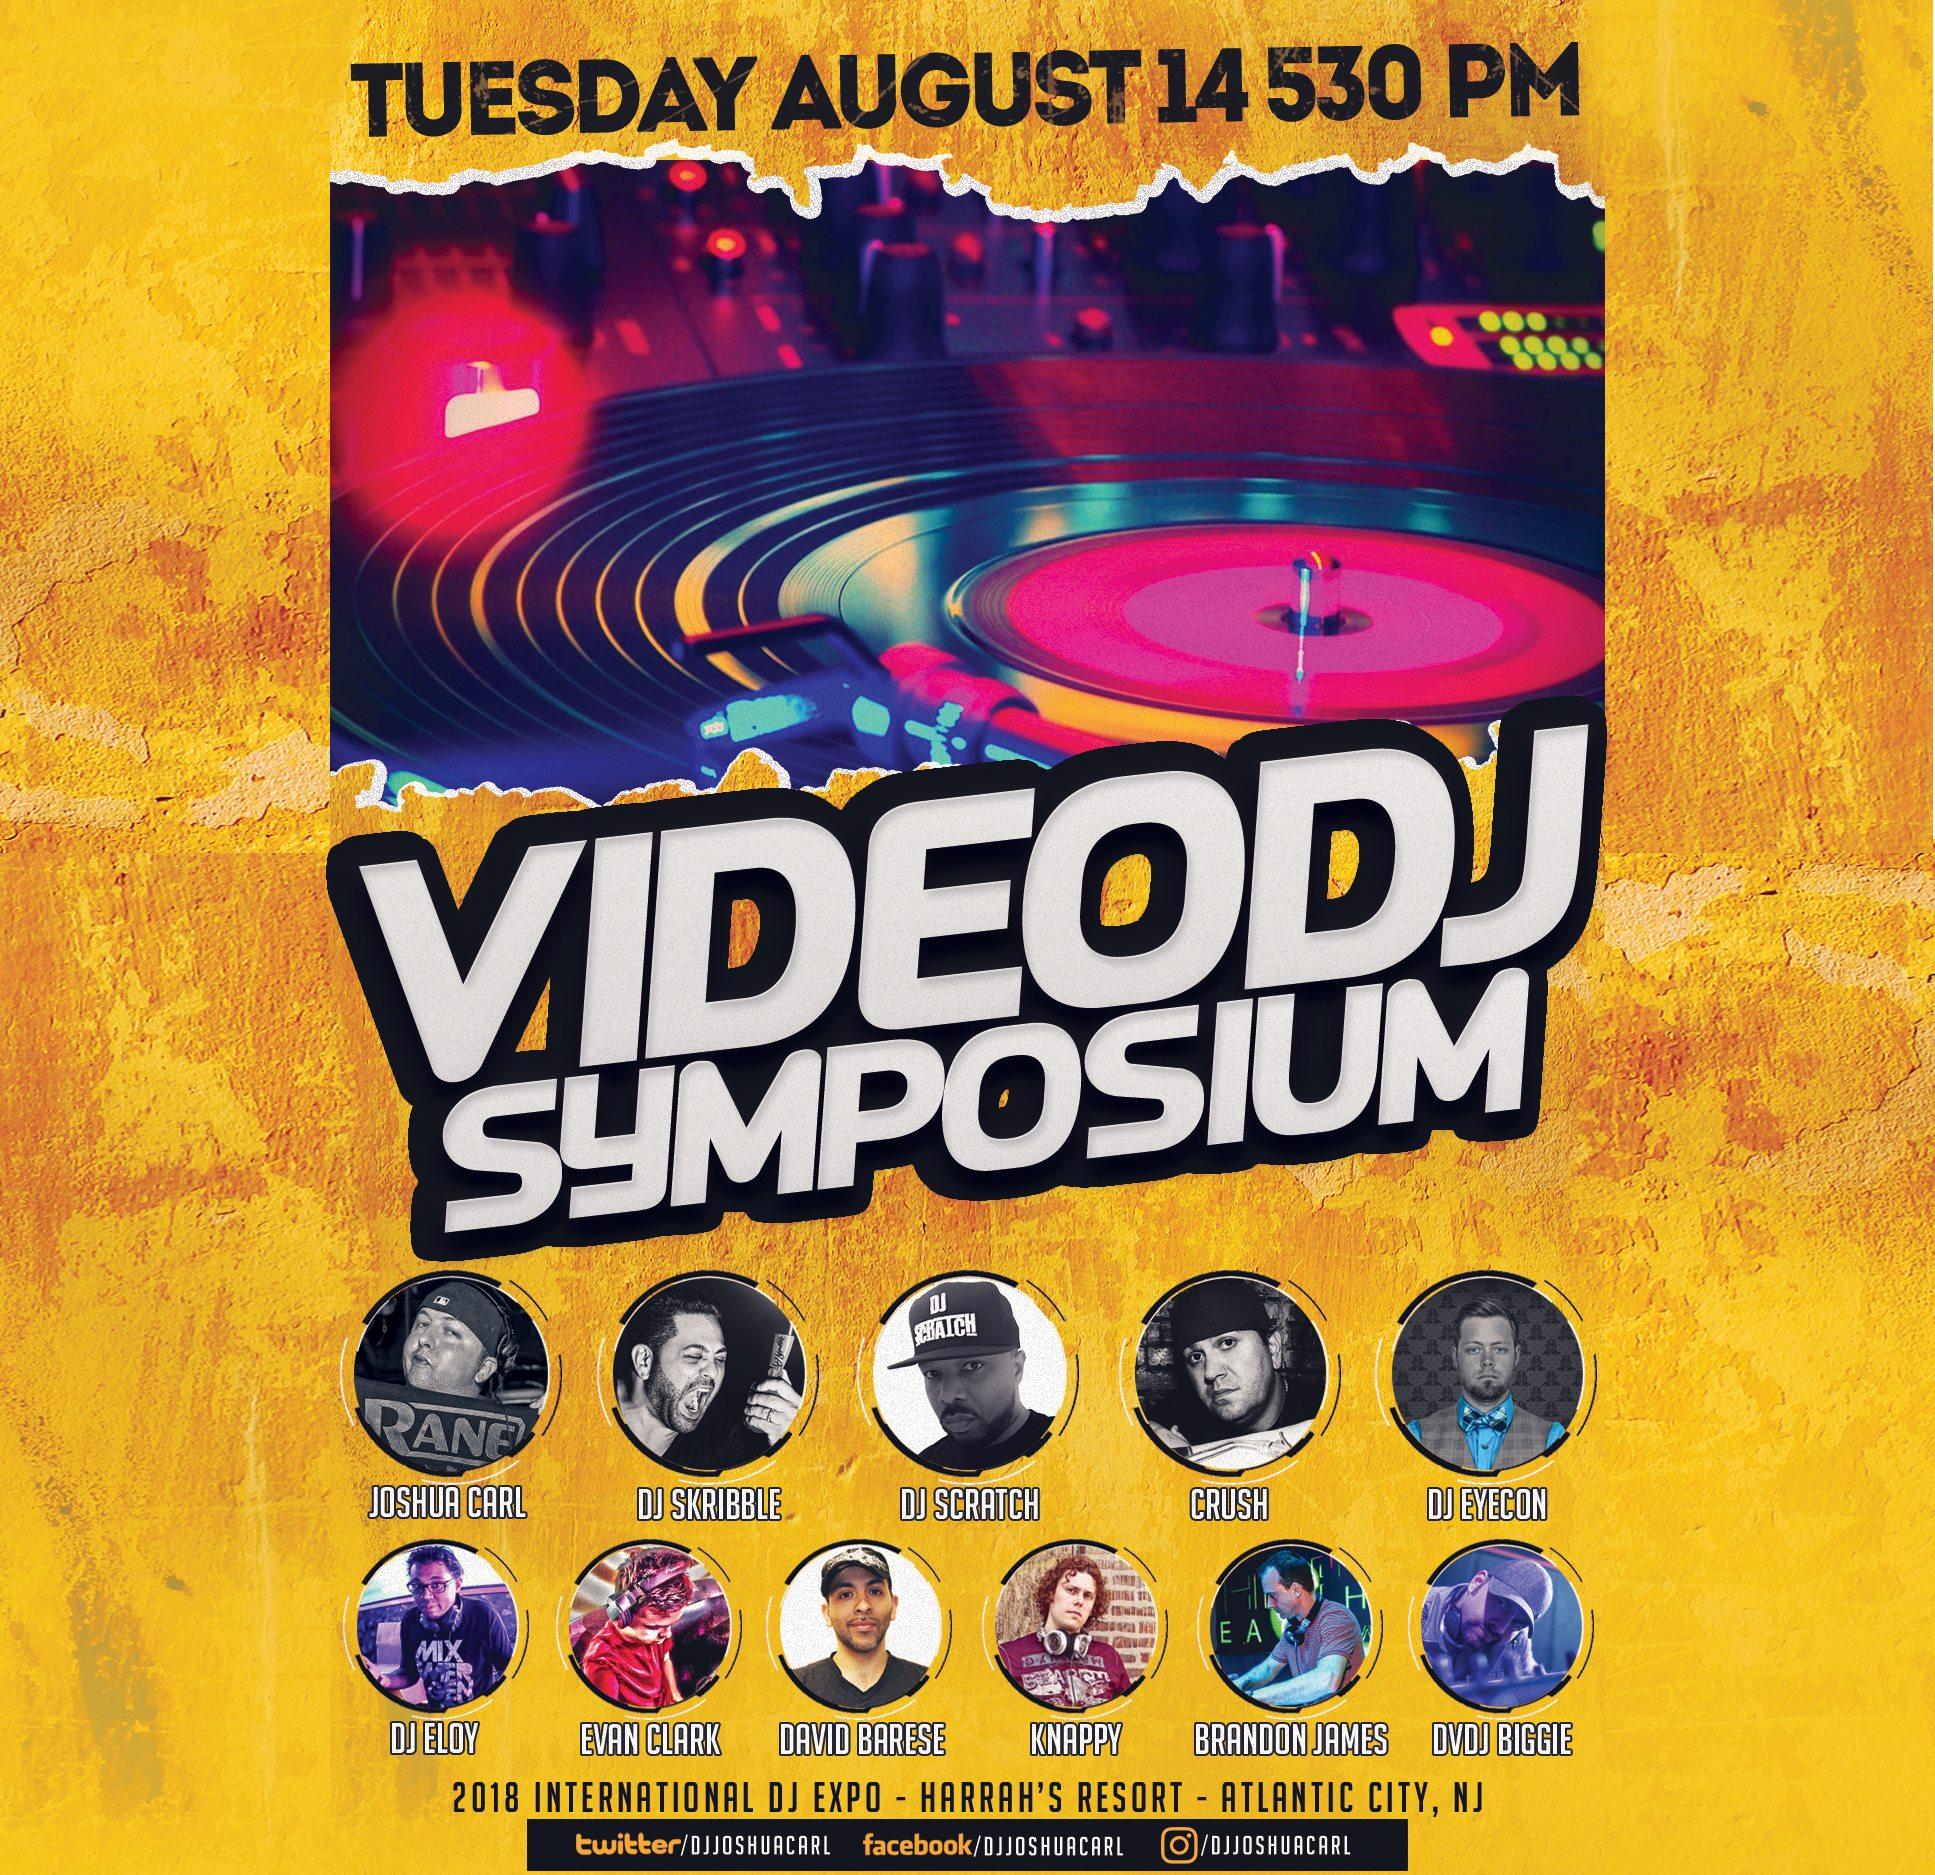 dj expo 2018 - video dj symposium flyer